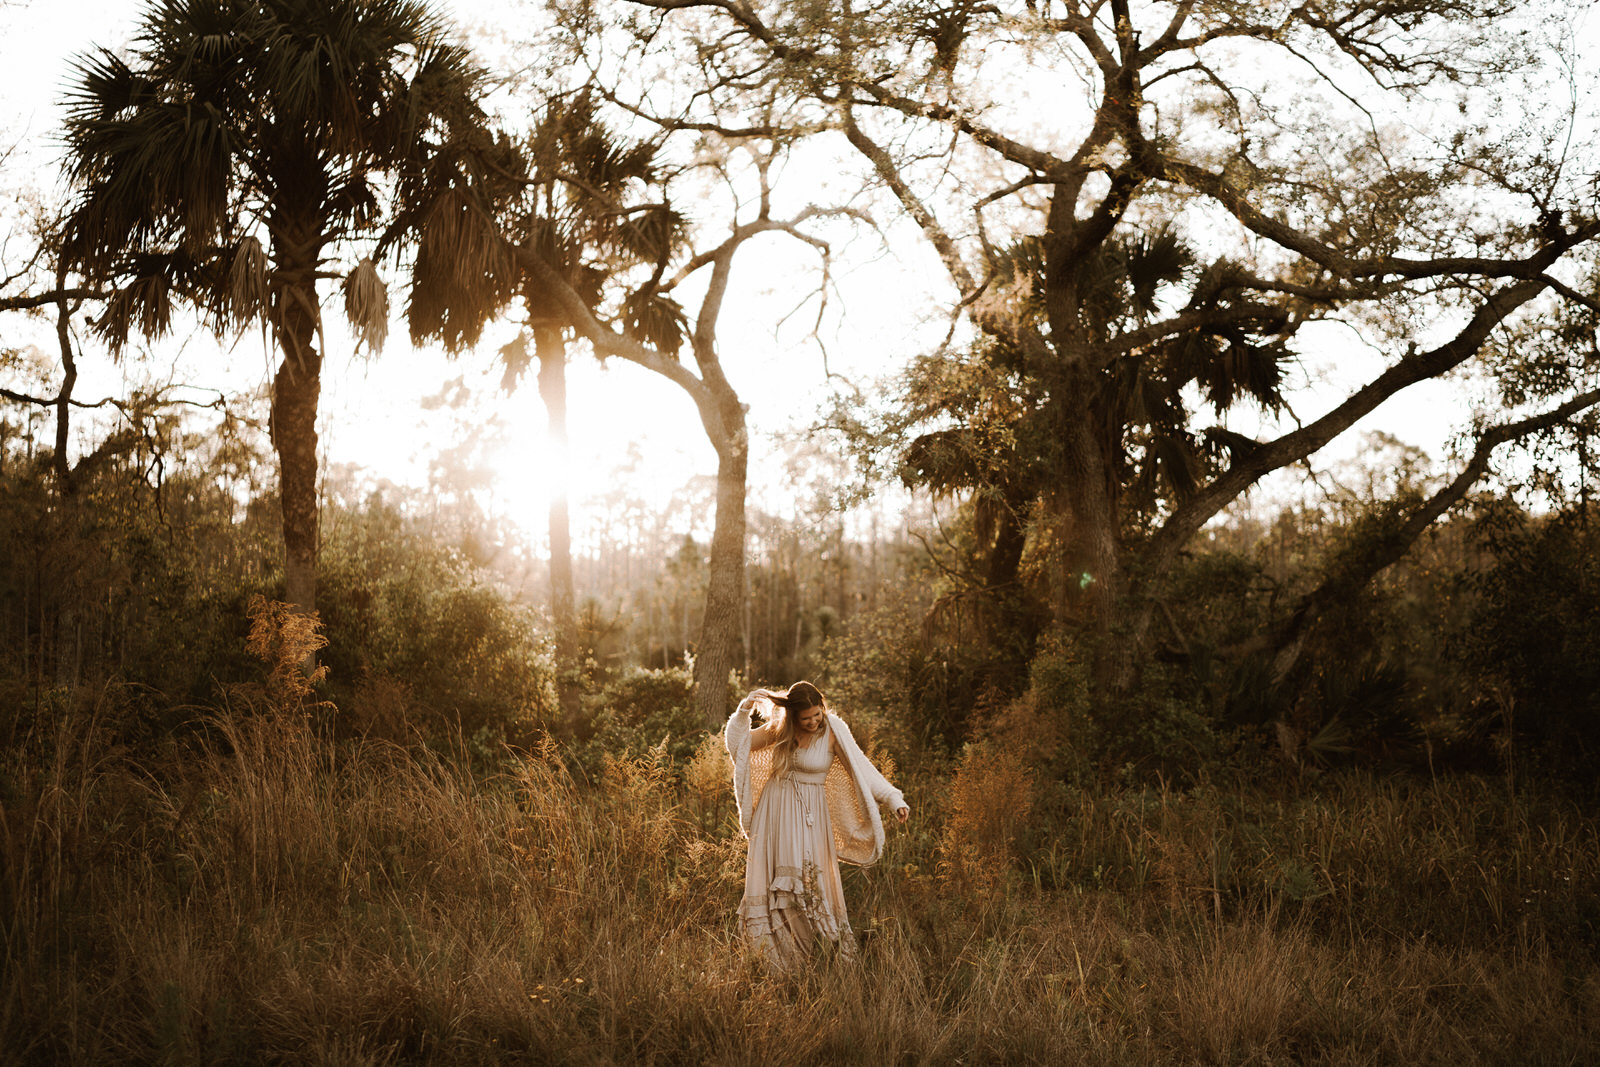 Fort Myers Senior Photos- Michelle Gonzalez Photography- Kristen Harder-146.JPG